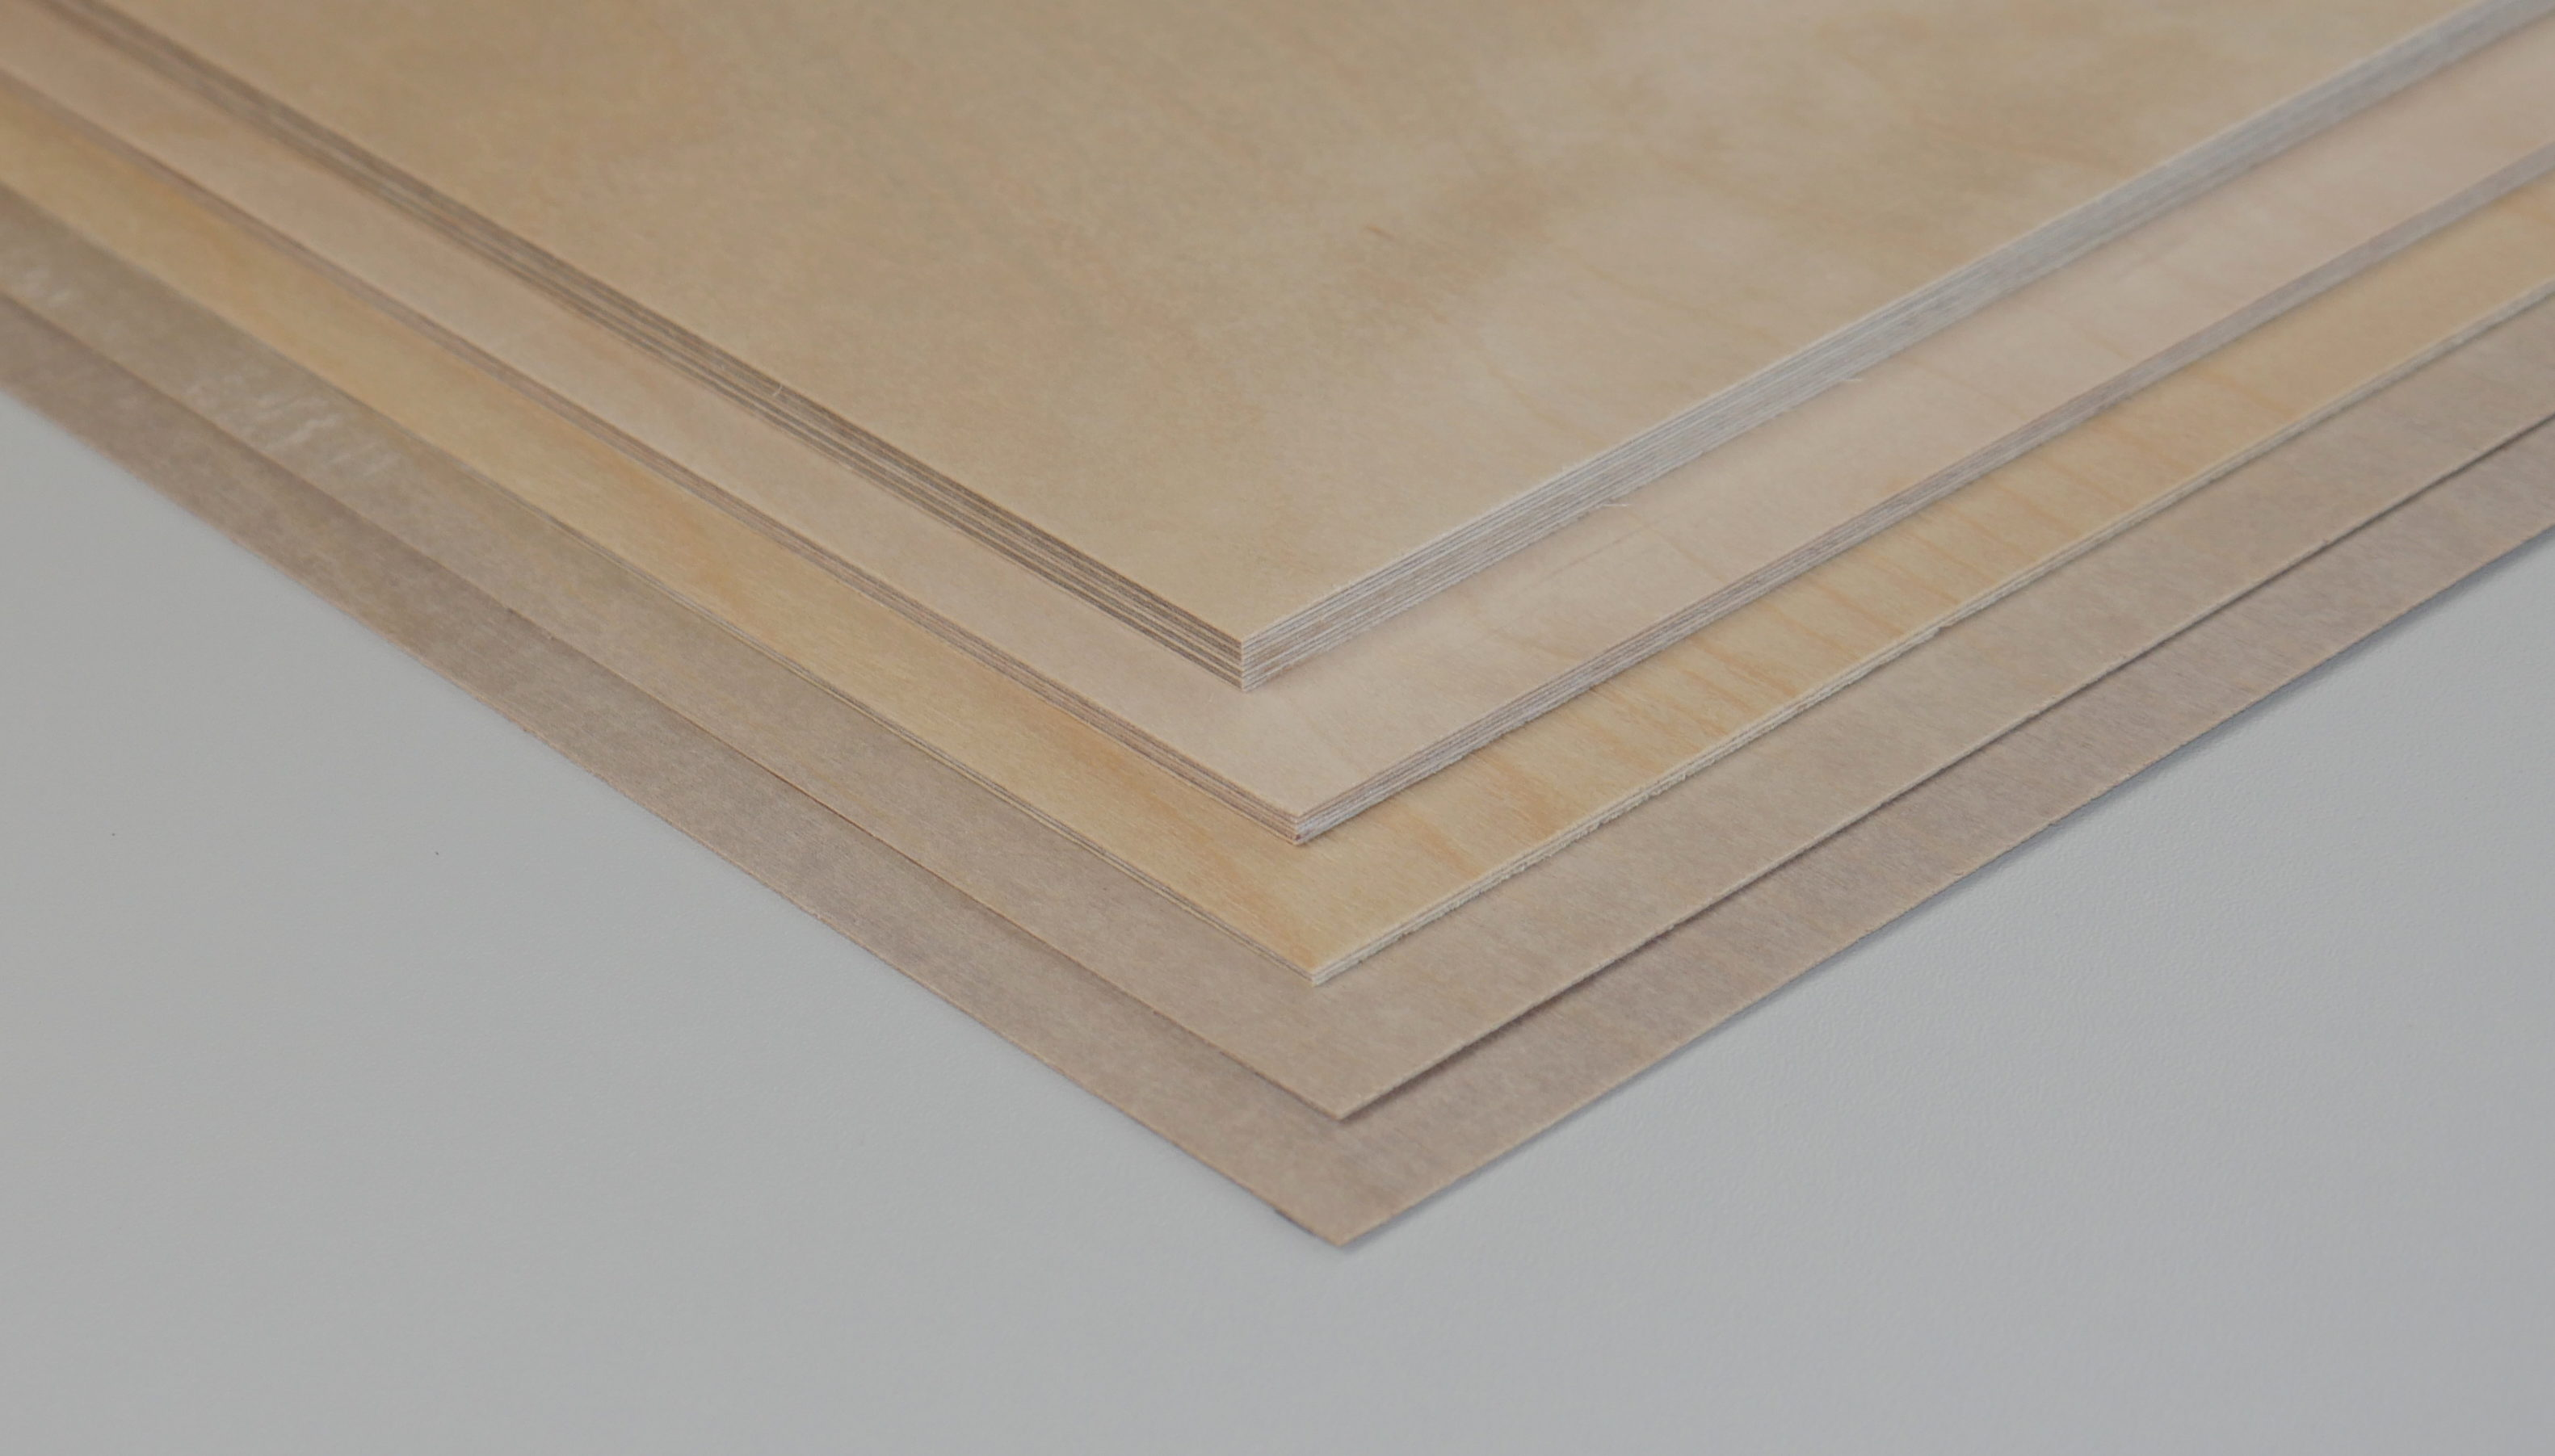 flugzeugsperrholz 1500 x 500 x 0 8 mm rik modellbau. Black Bedroom Furniture Sets. Home Design Ideas